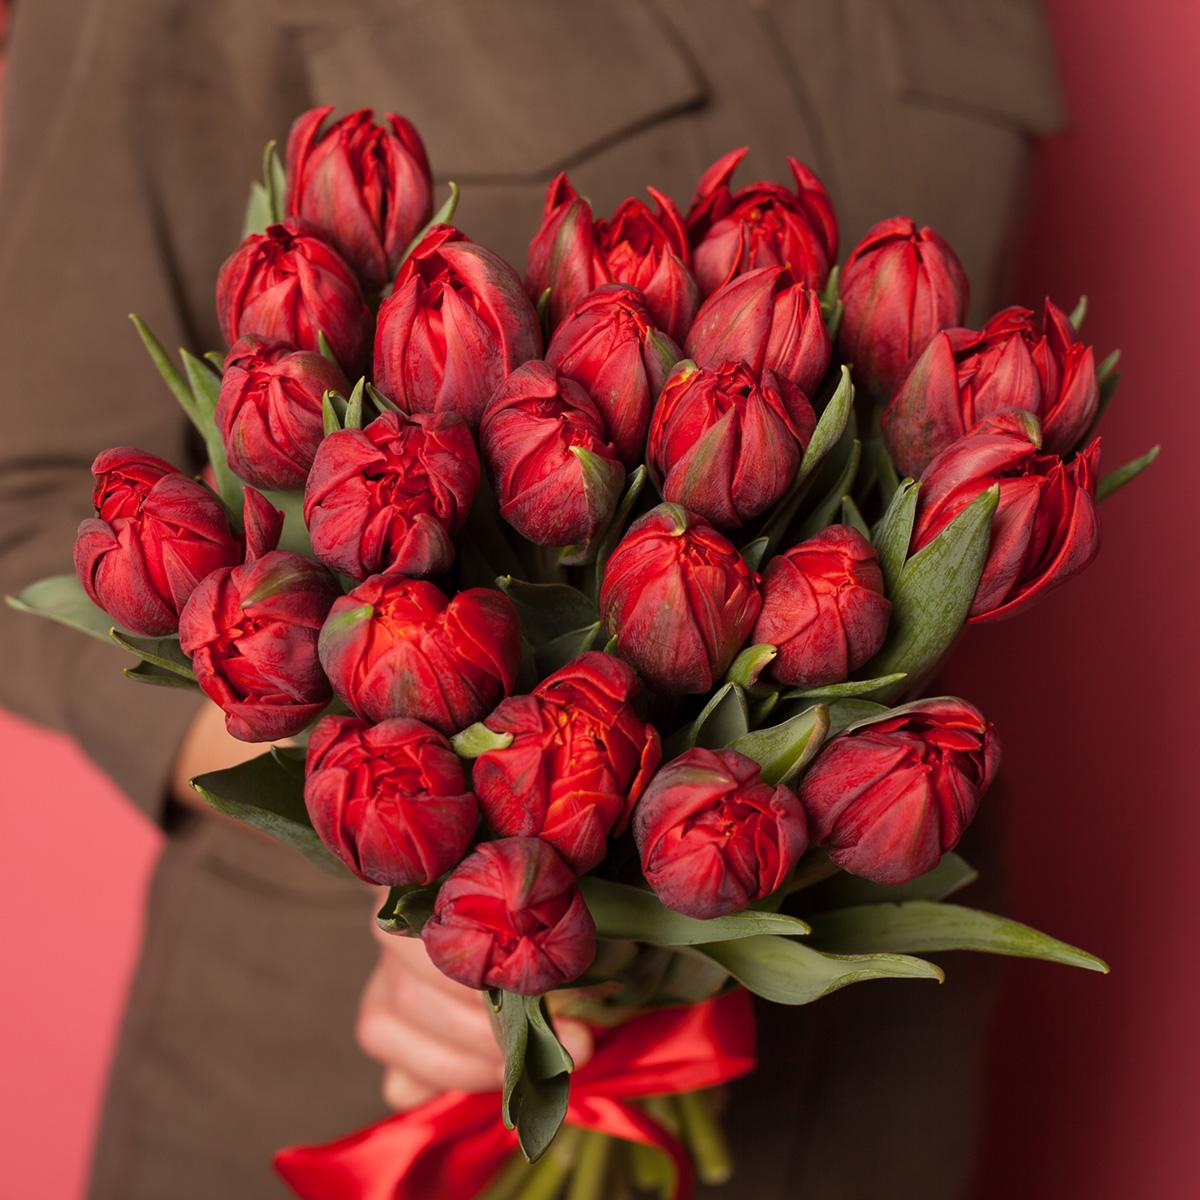 25 тюльпанов Red Prince в руках